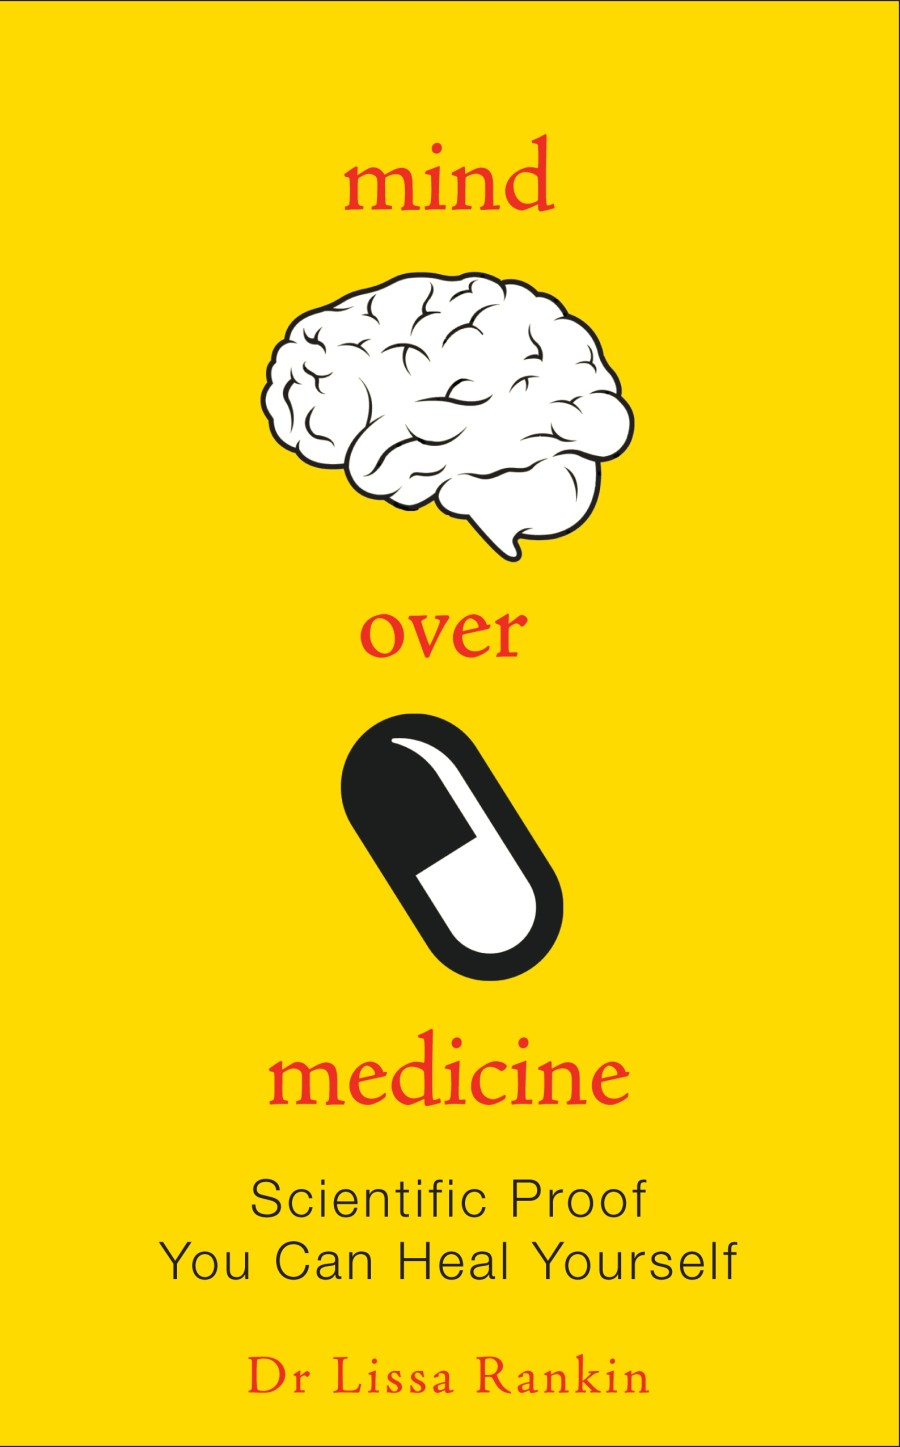 mind-over-medicine